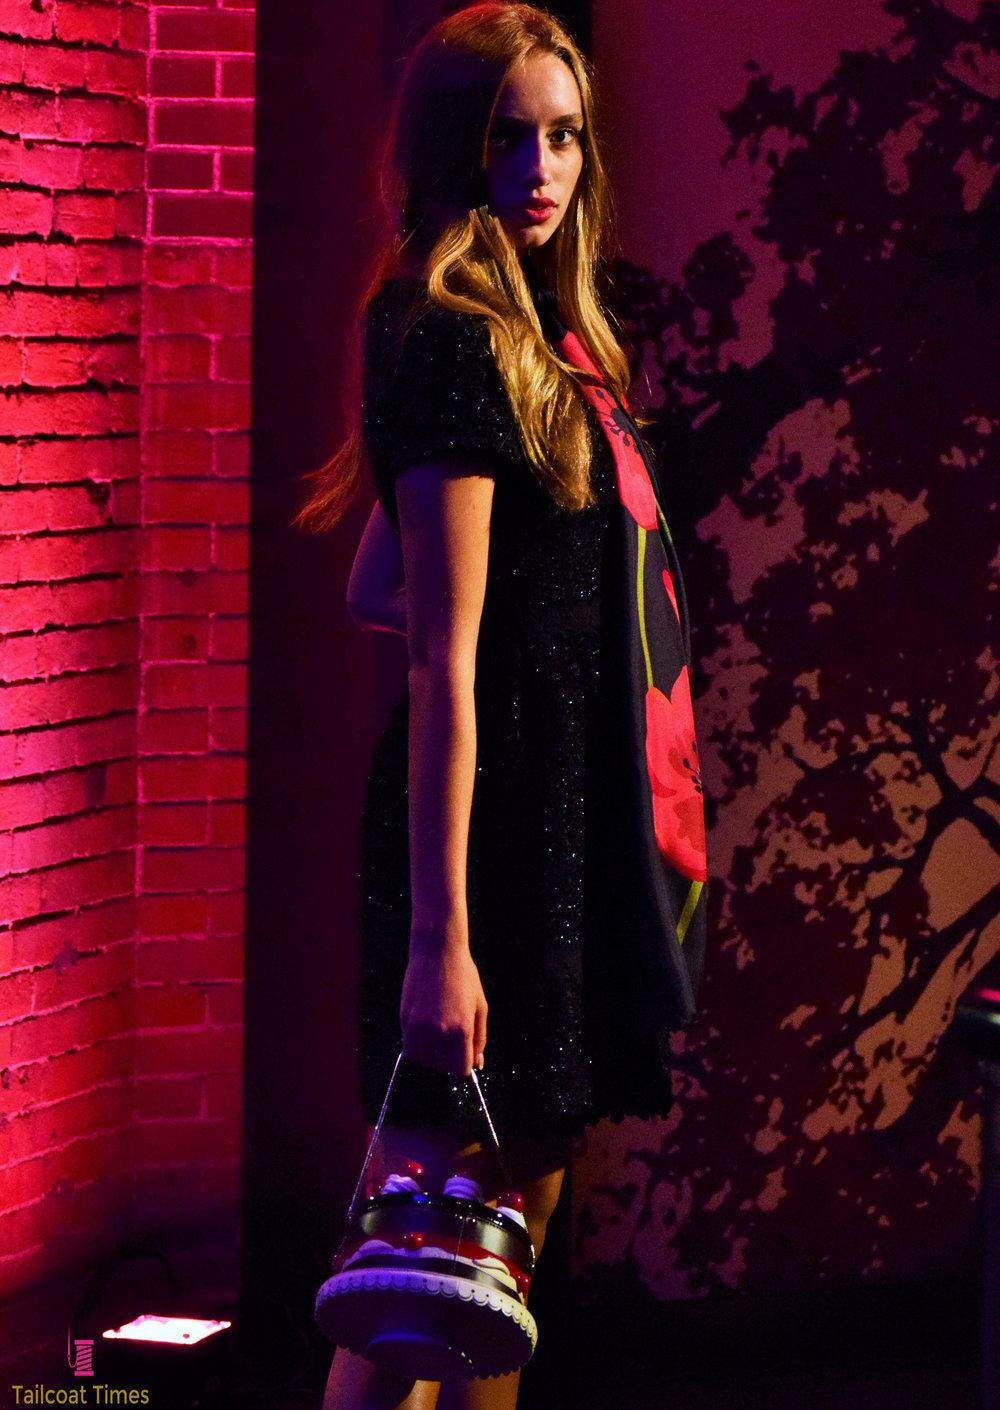 FashionablyLate_Kate Spade_Tailcoat Times (16 of 23).jpg